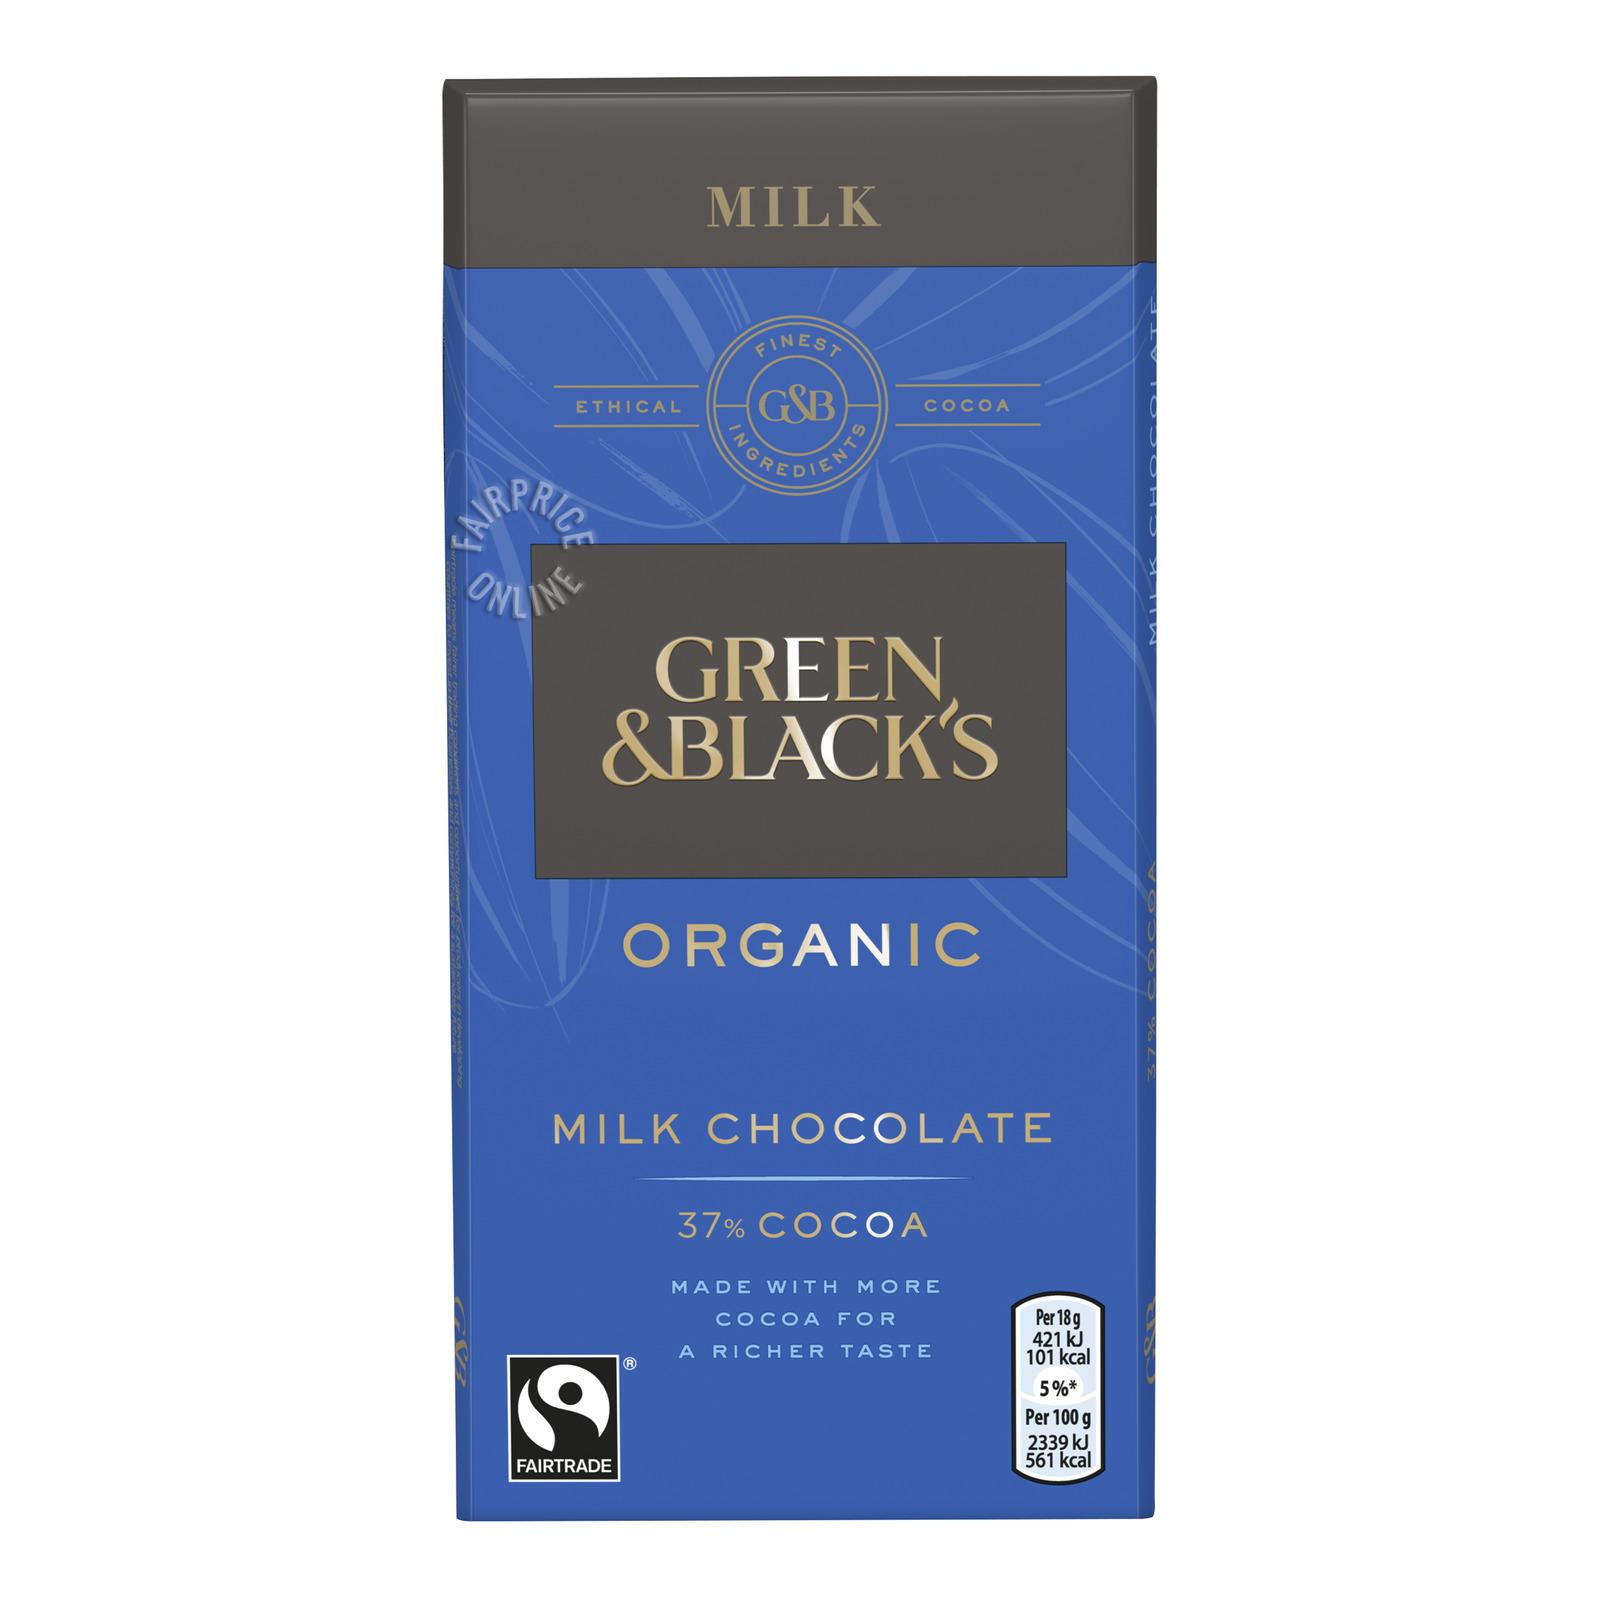 GREEN & BLACKS Organic Milk Chocolate 37% 90g